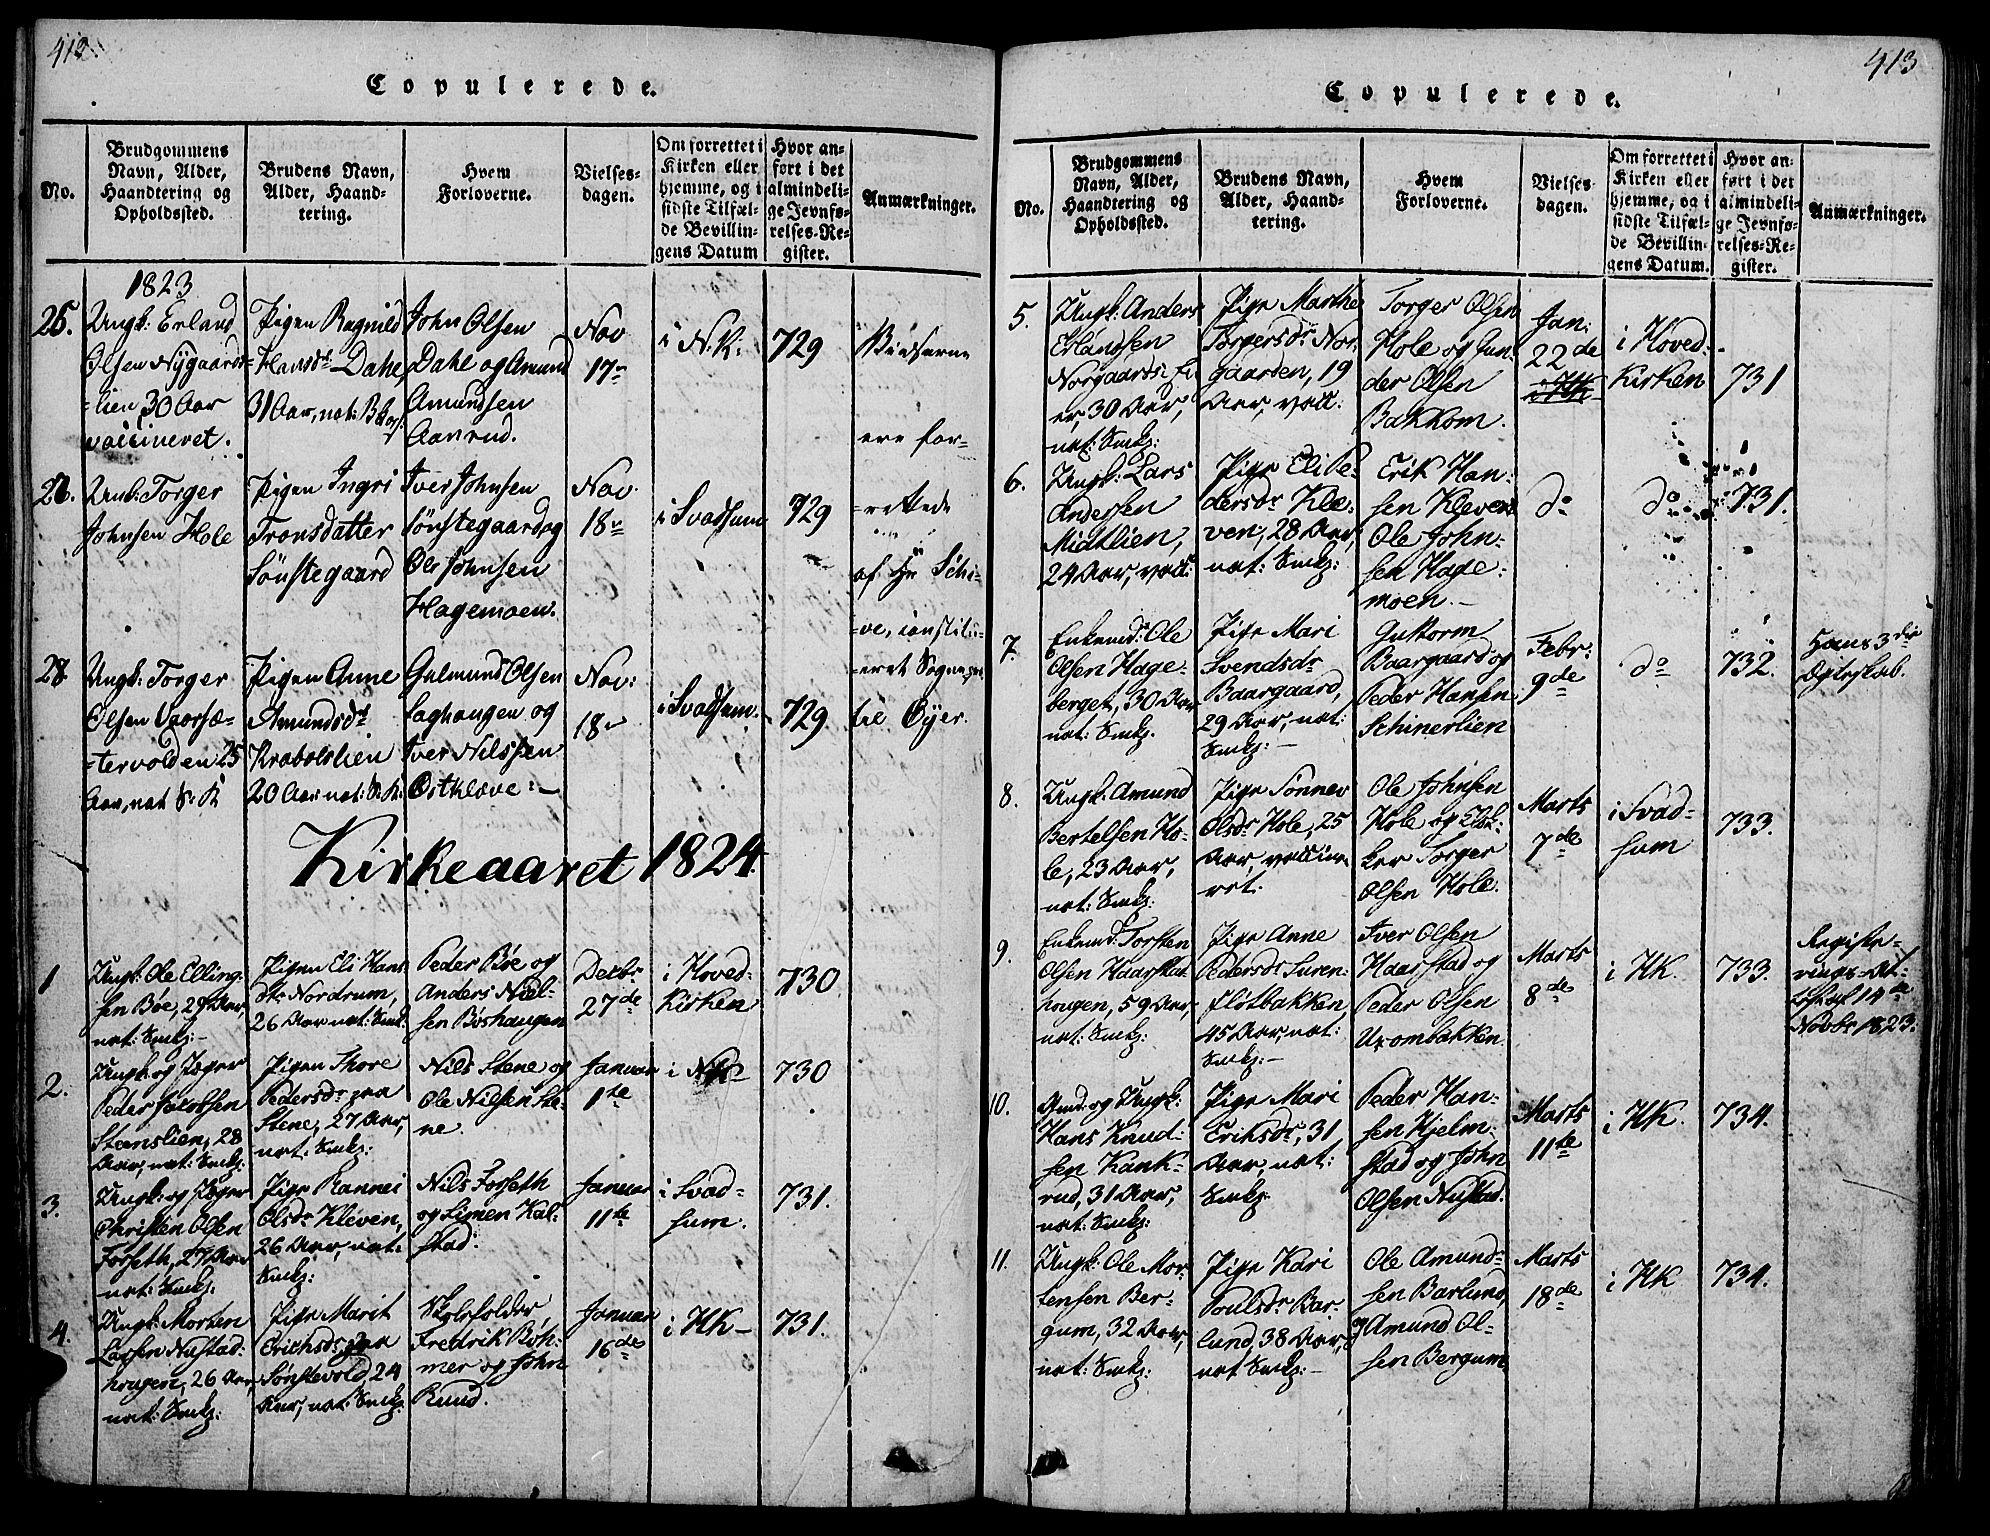 SAH, Gausdal prestekontor, Ministerialbok nr. 5, 1817-1829, s. 412-413